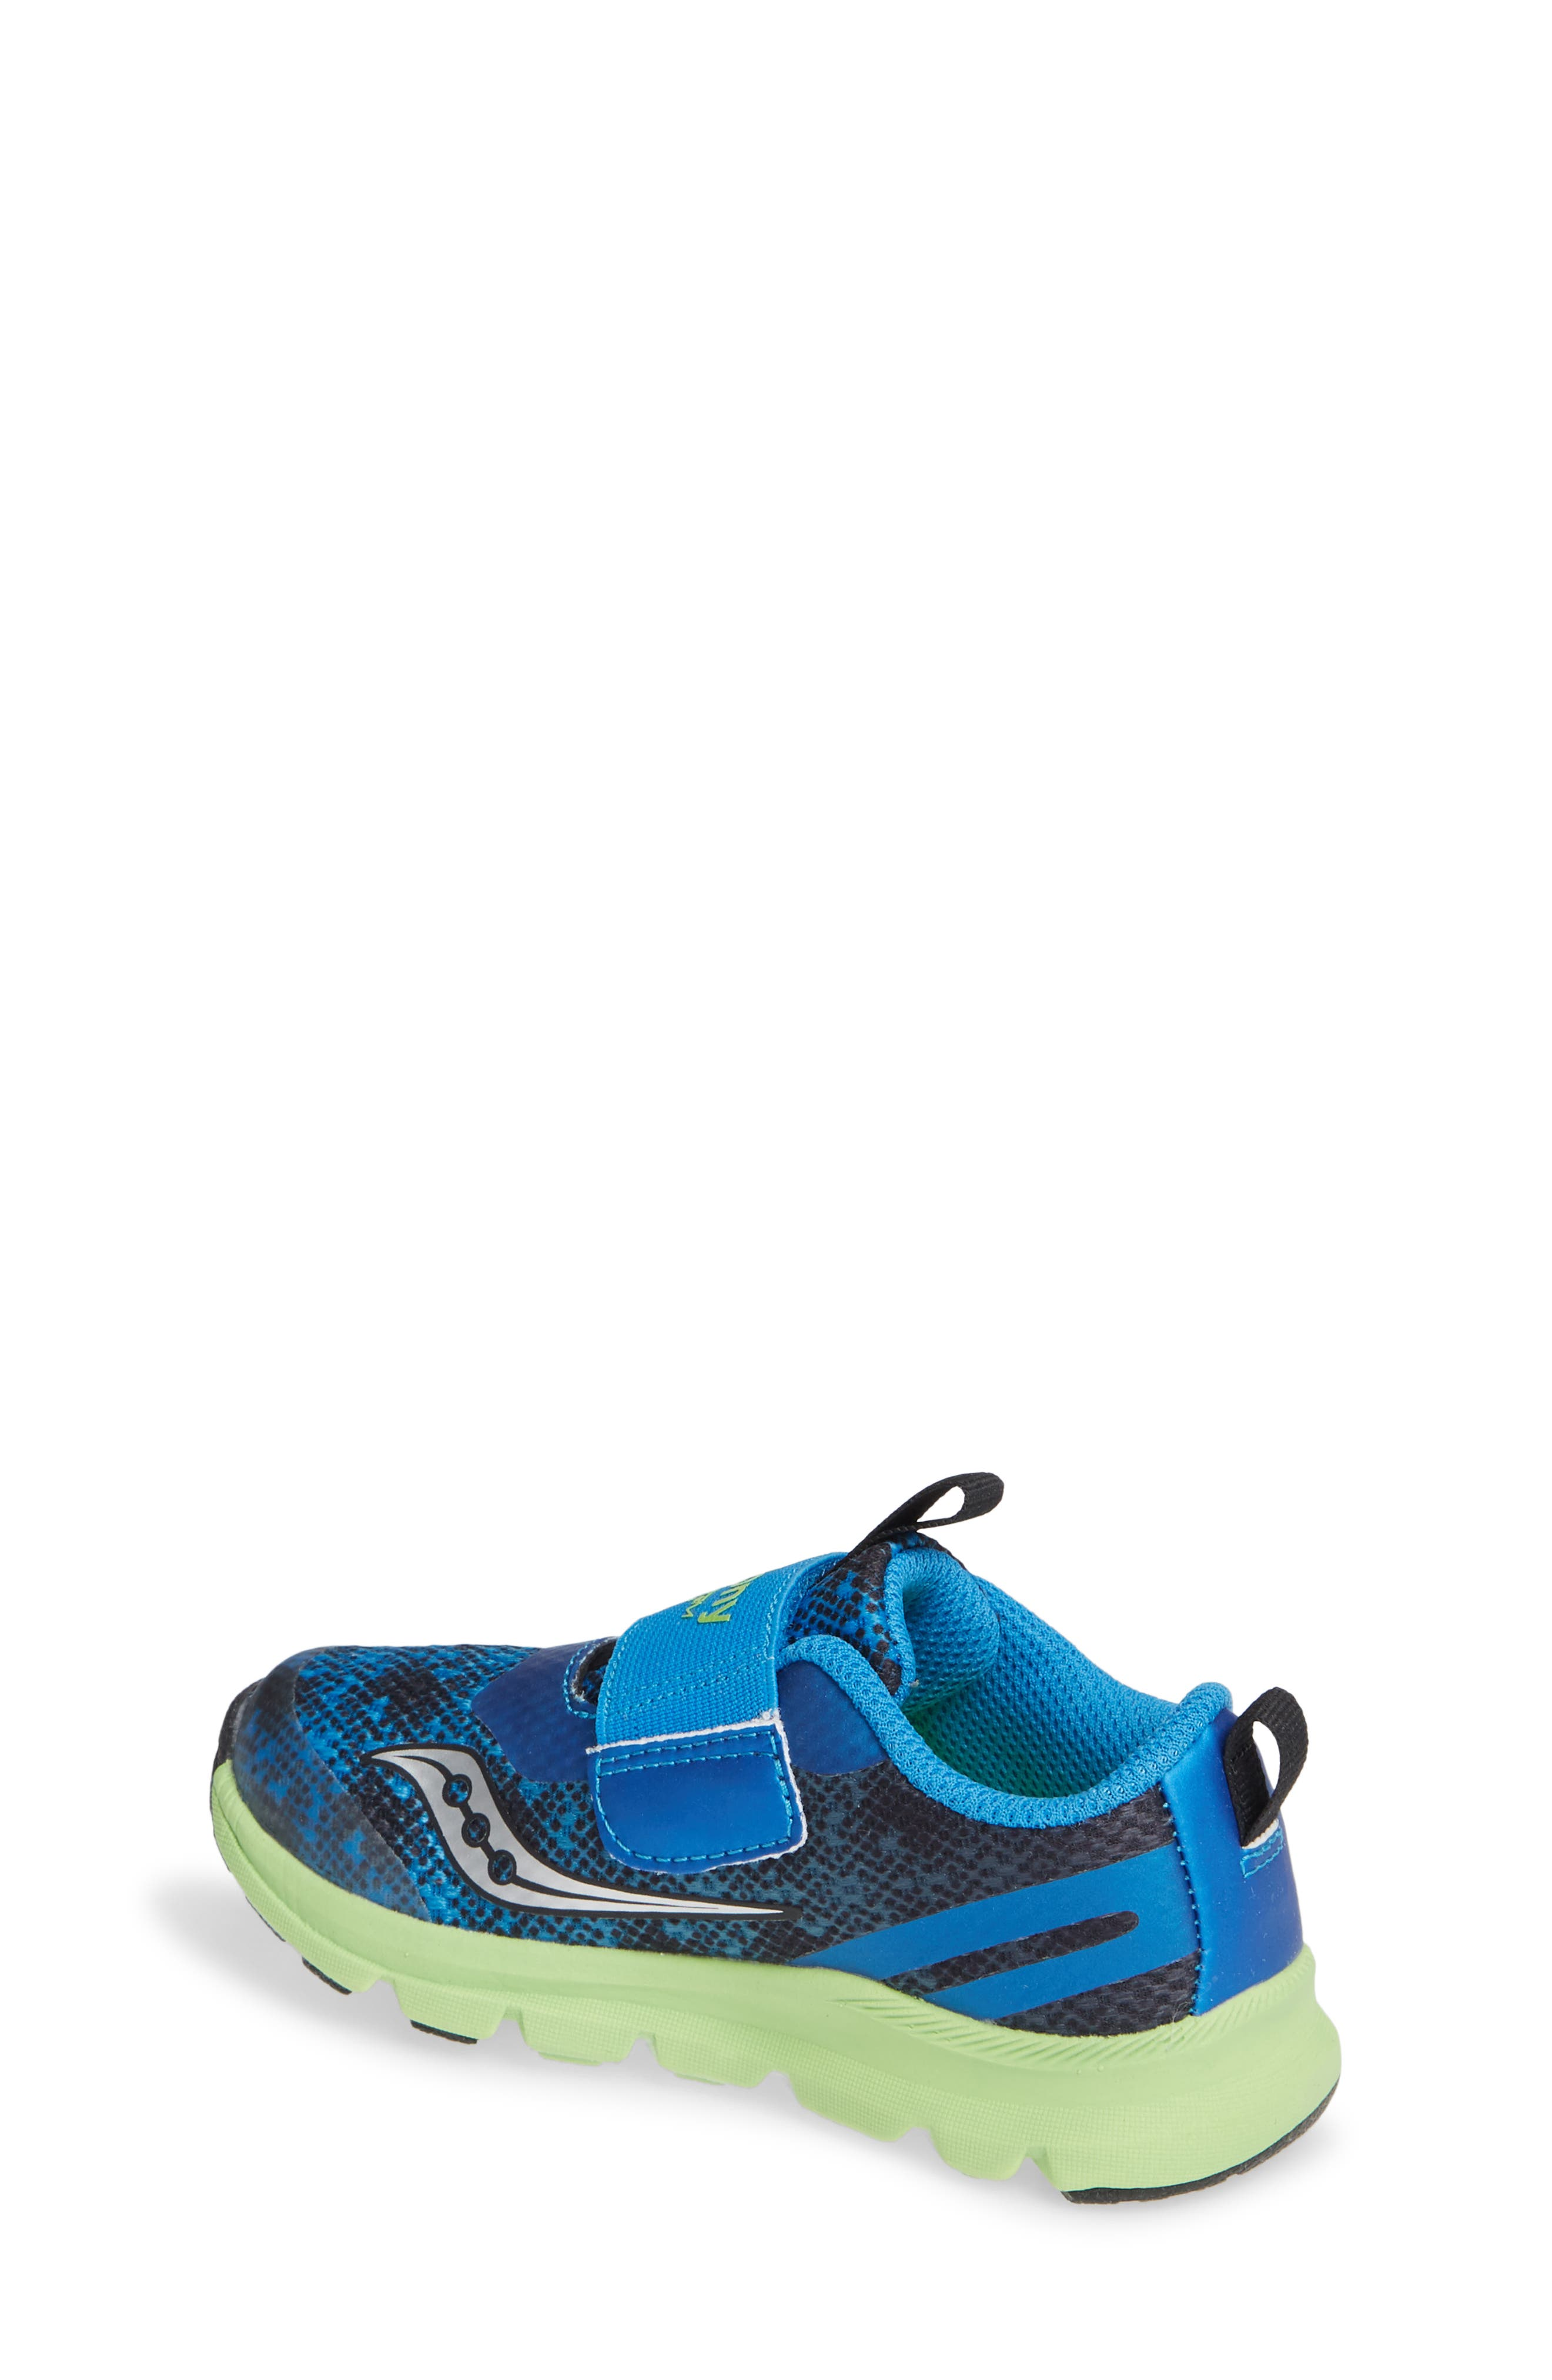 Baby Liteform Sneaker,                             Alternate thumbnail 2, color,                             BLUE/ GREEN